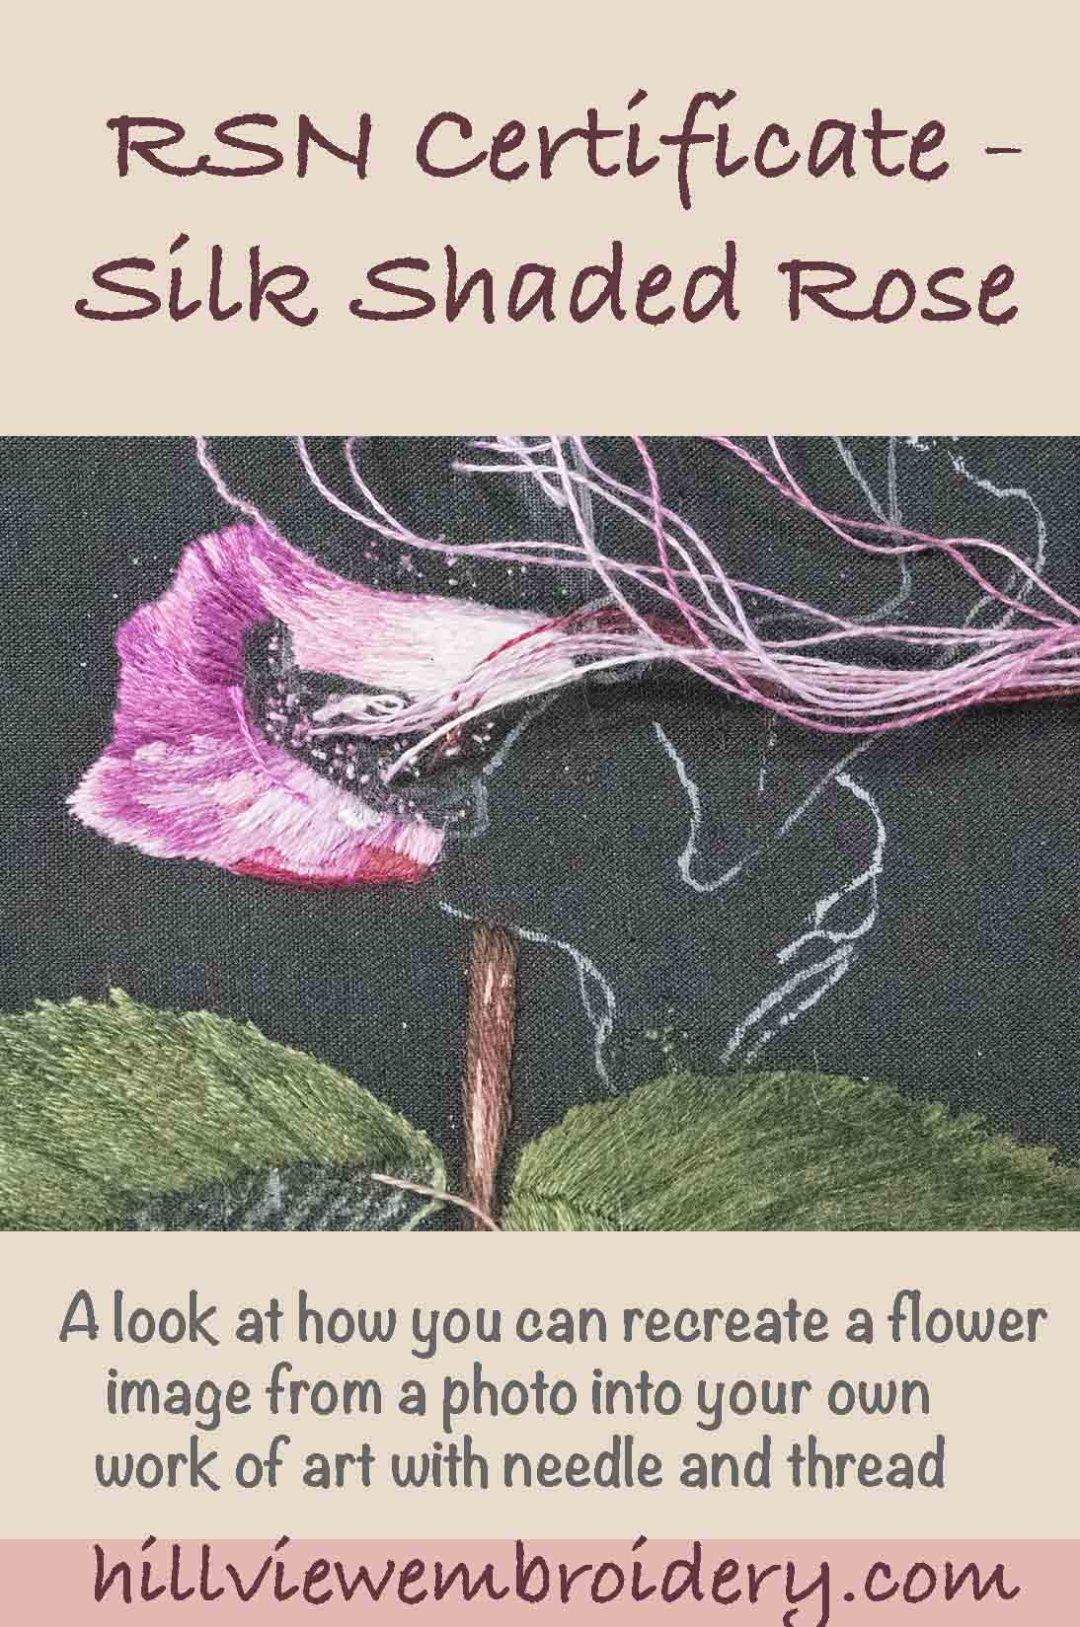 RSN Certificate Silk shading rose update